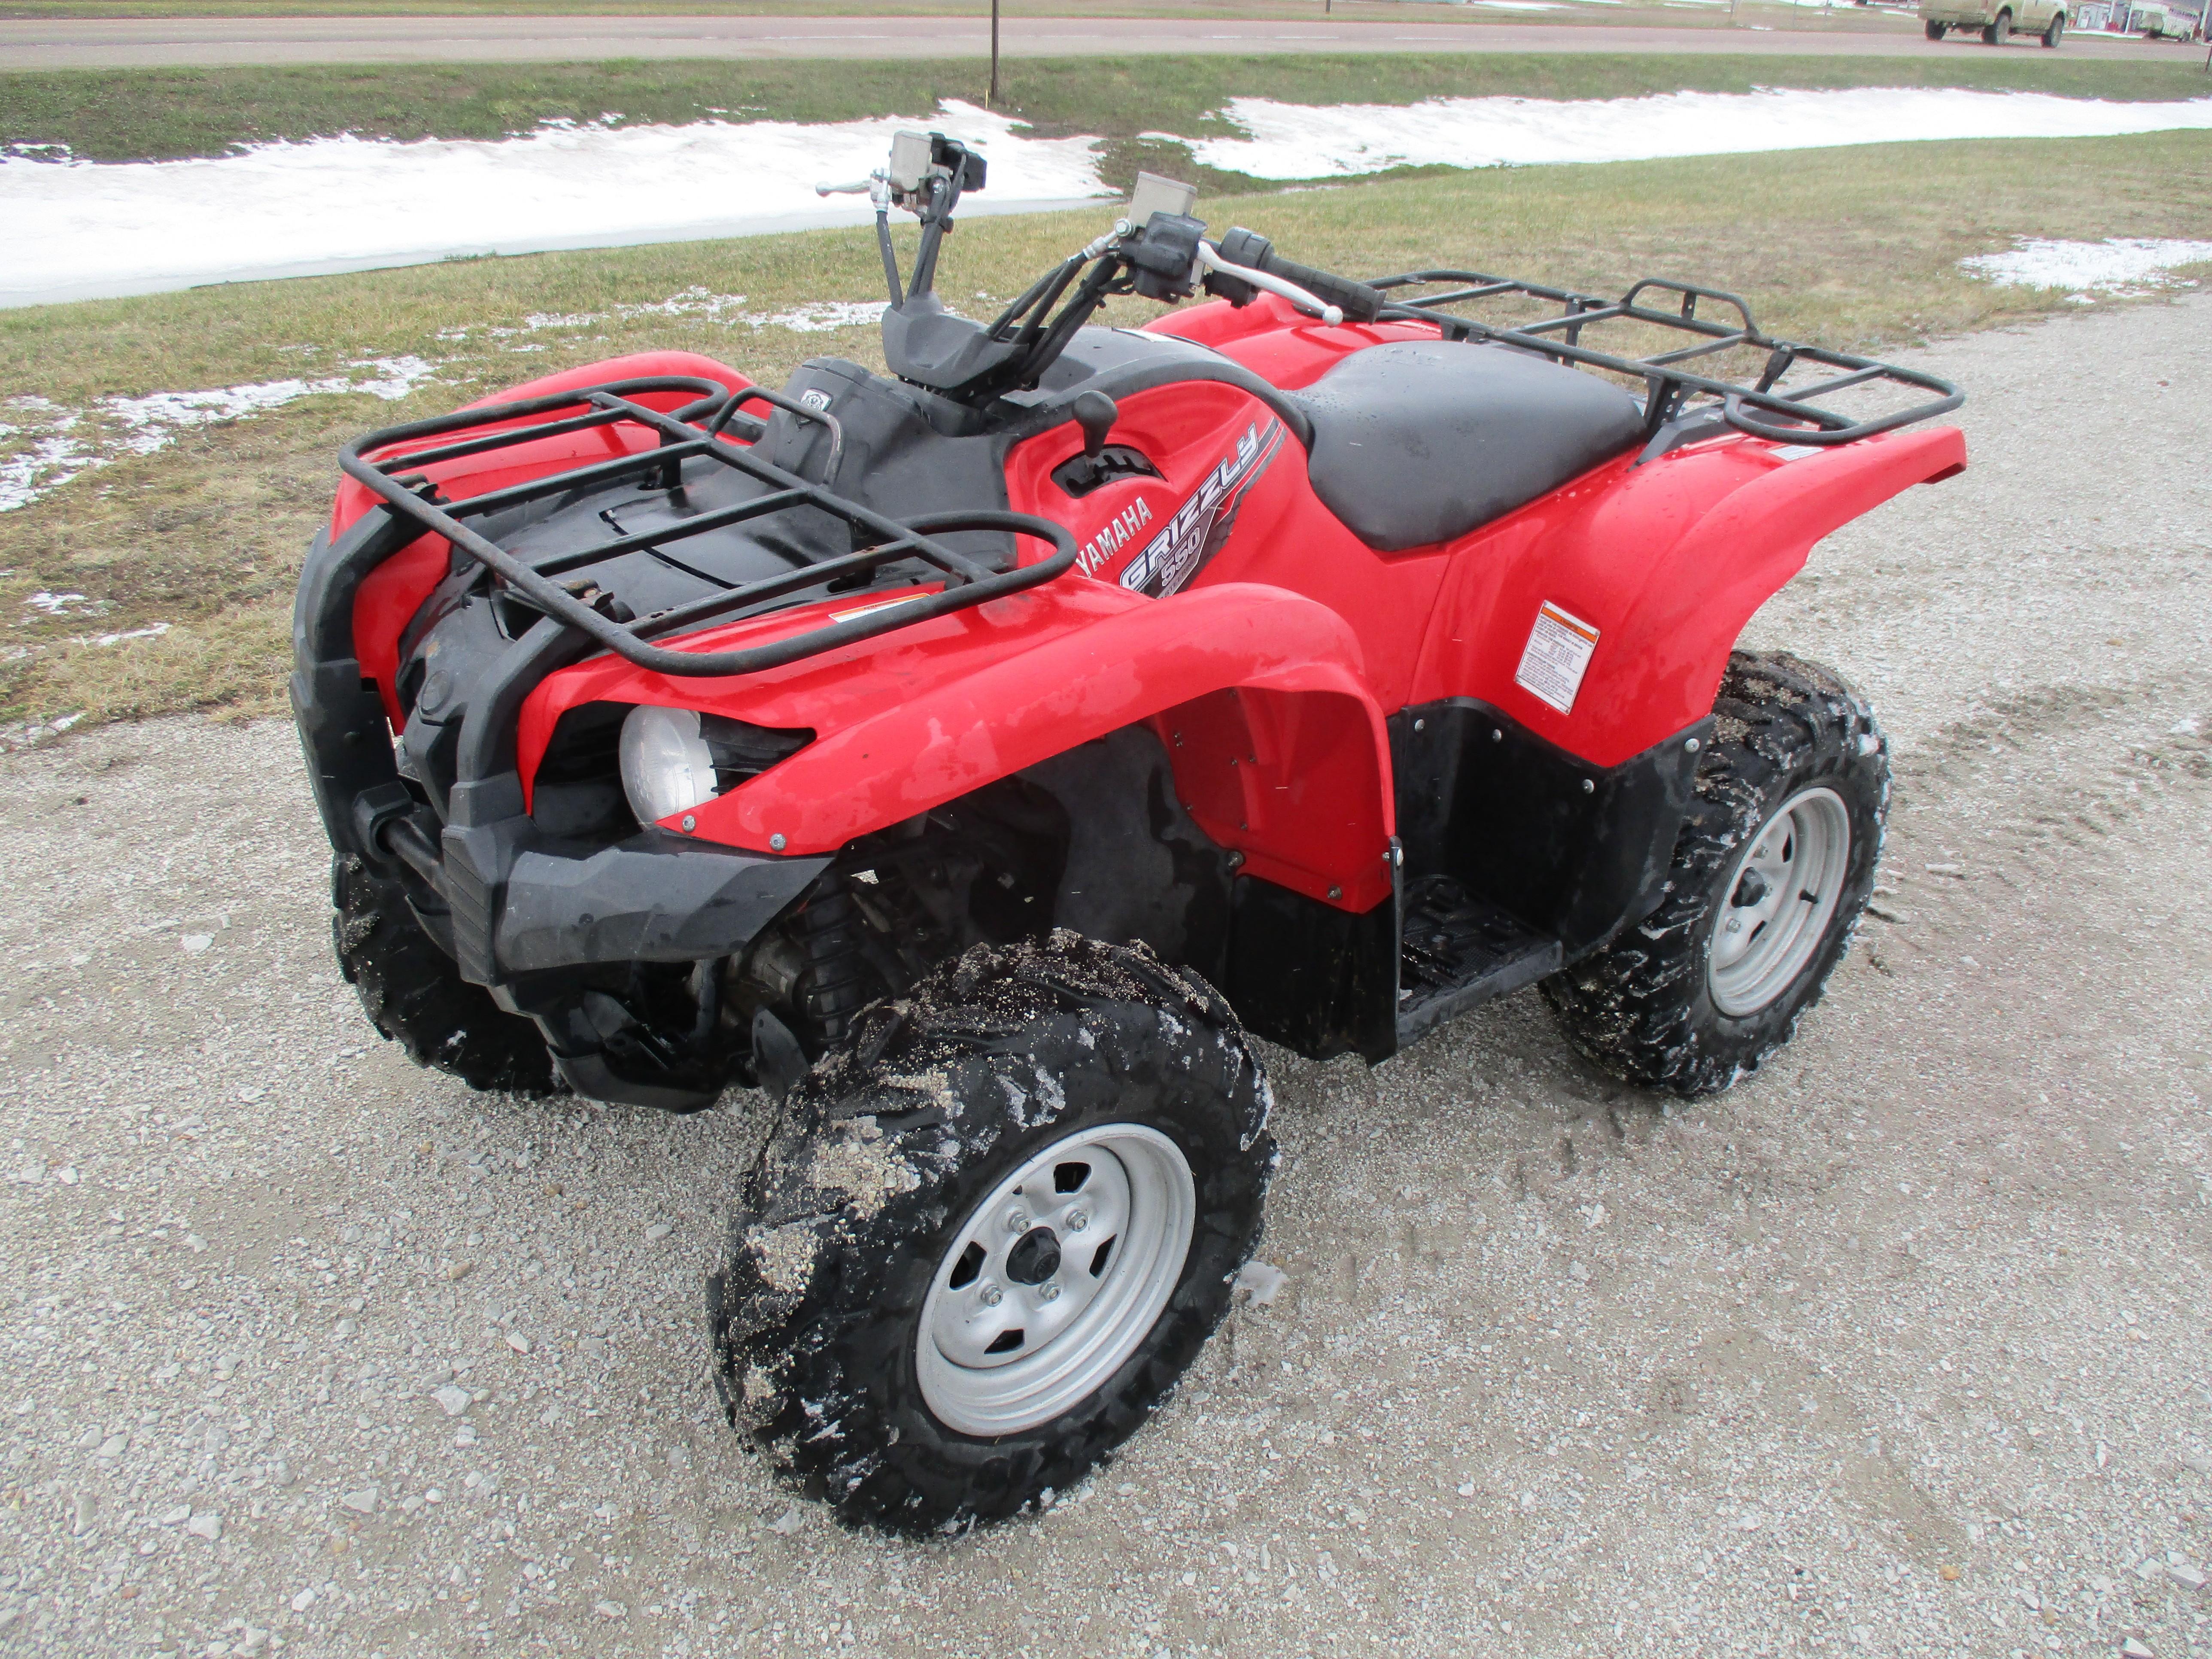 2014 Yamaha Grizzly 700 4x4 EPS